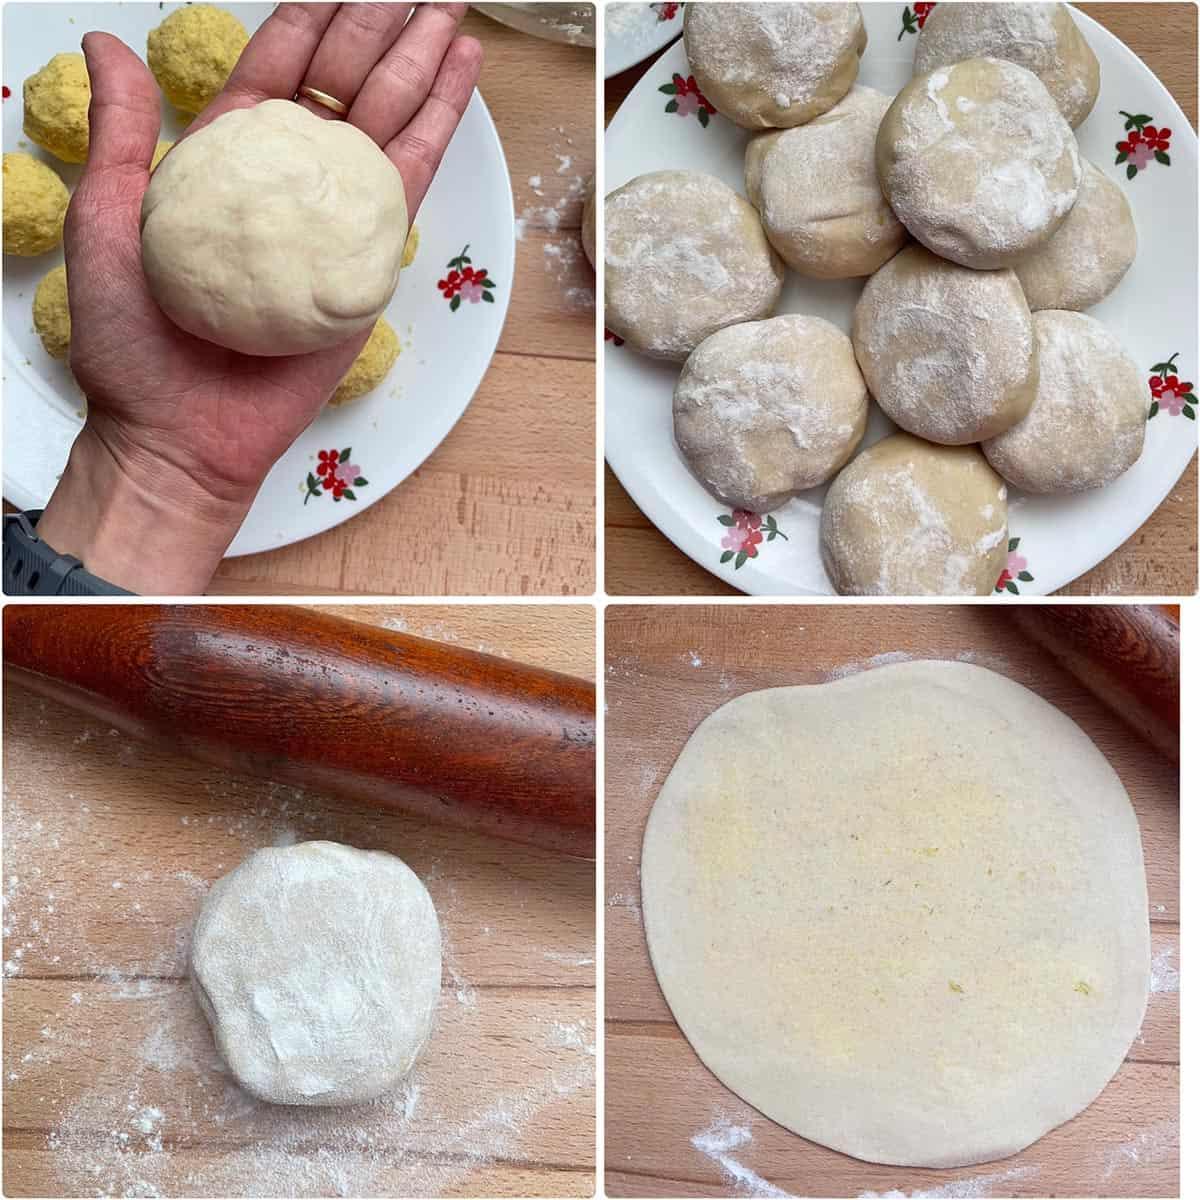 Rolling out stuffed flatbread